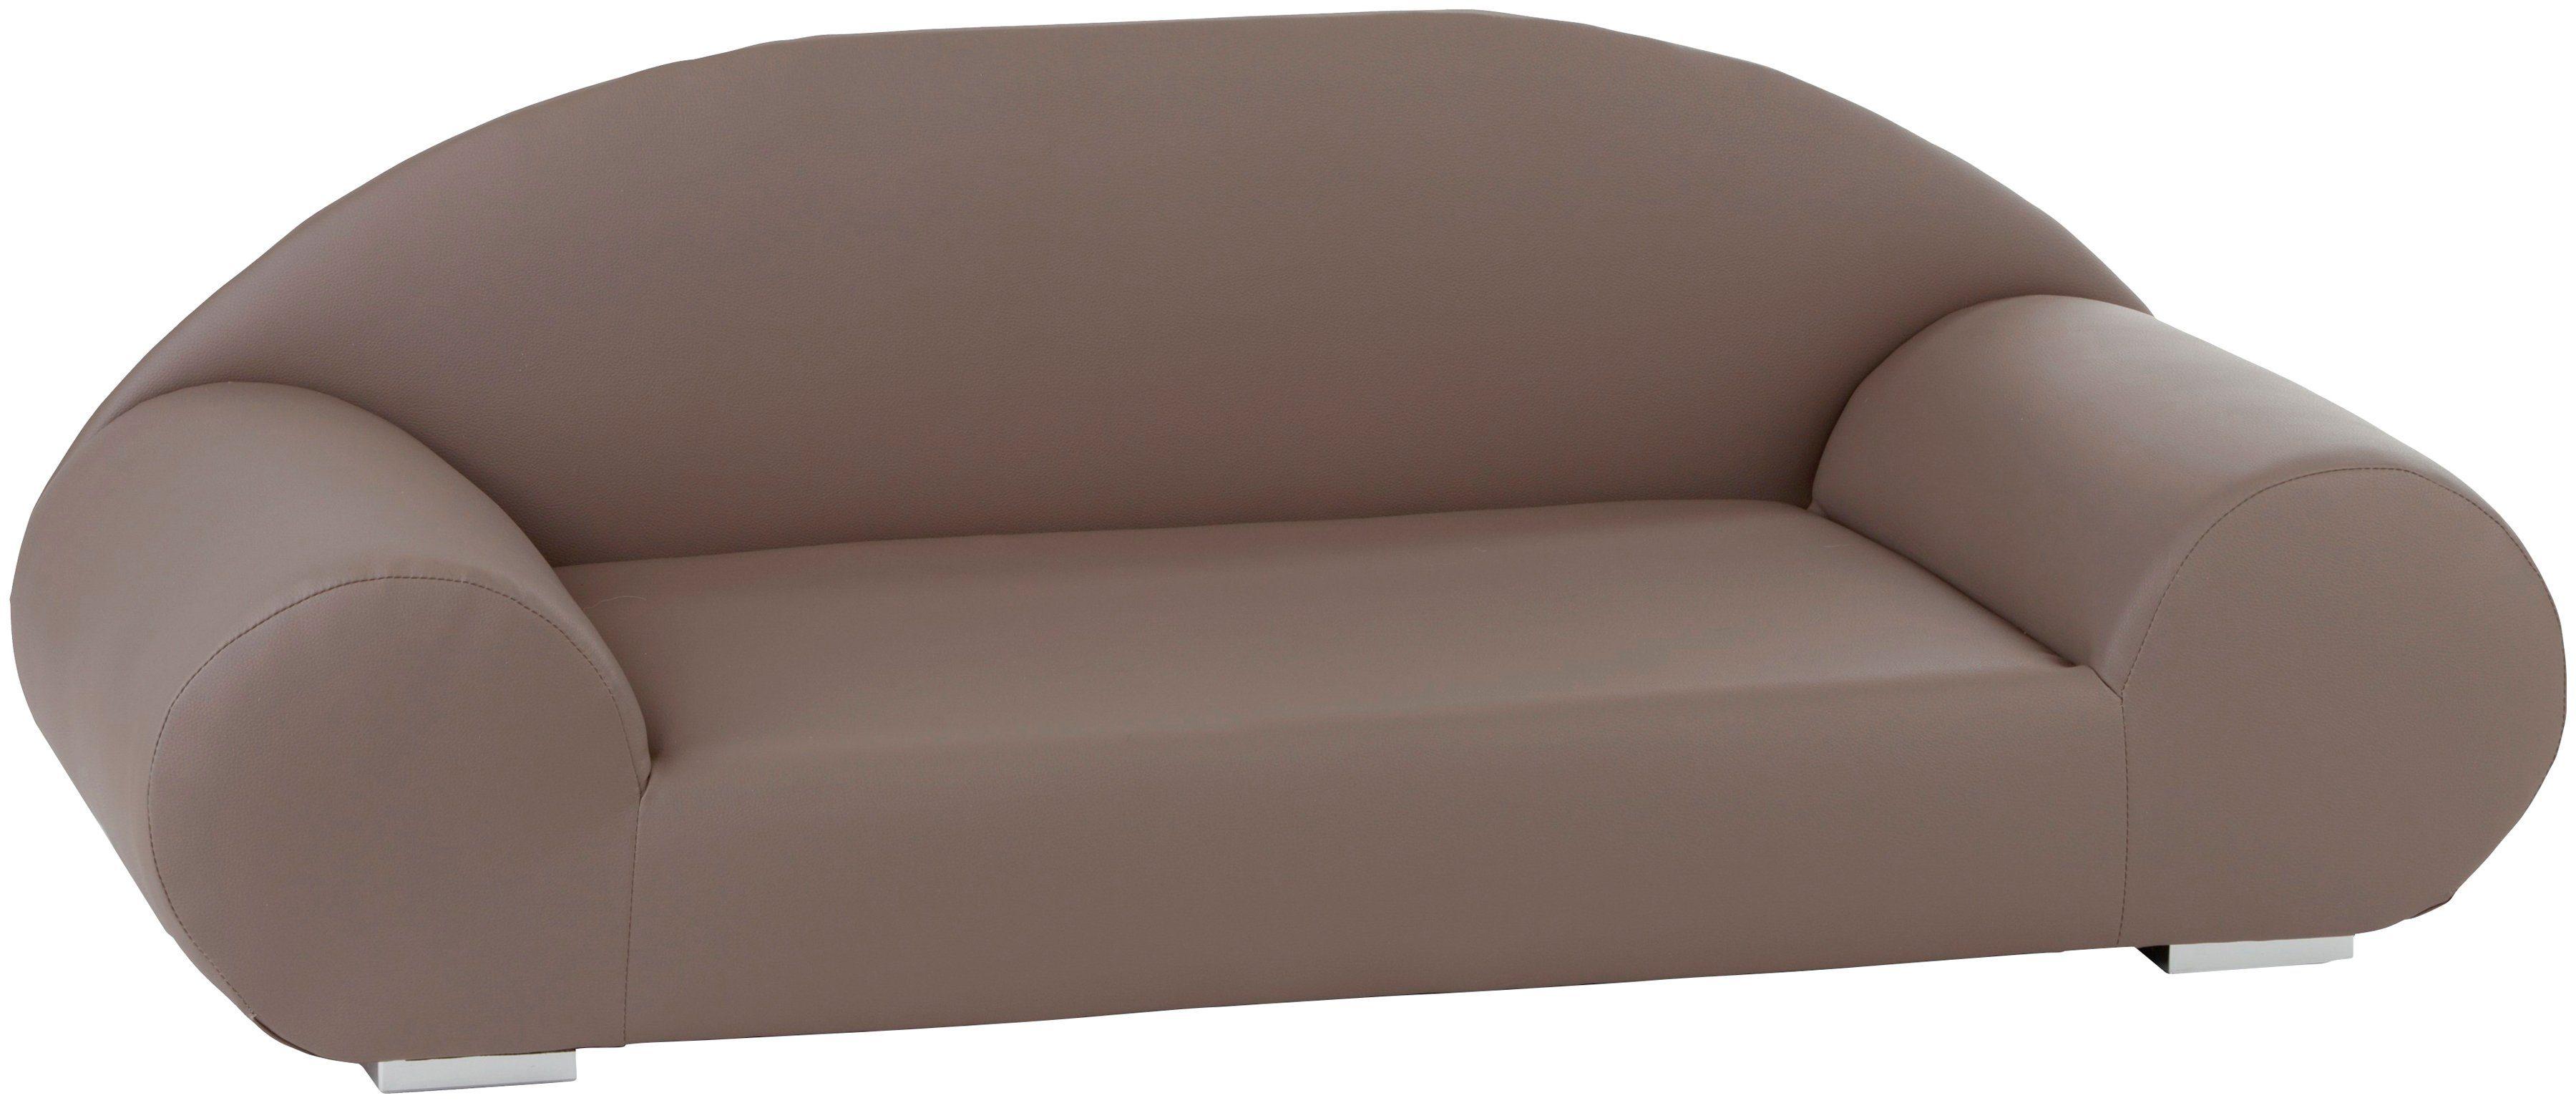 SILVIO DESIGN Hundesofa »Mona«, BxLxH: 122x53x45 cm